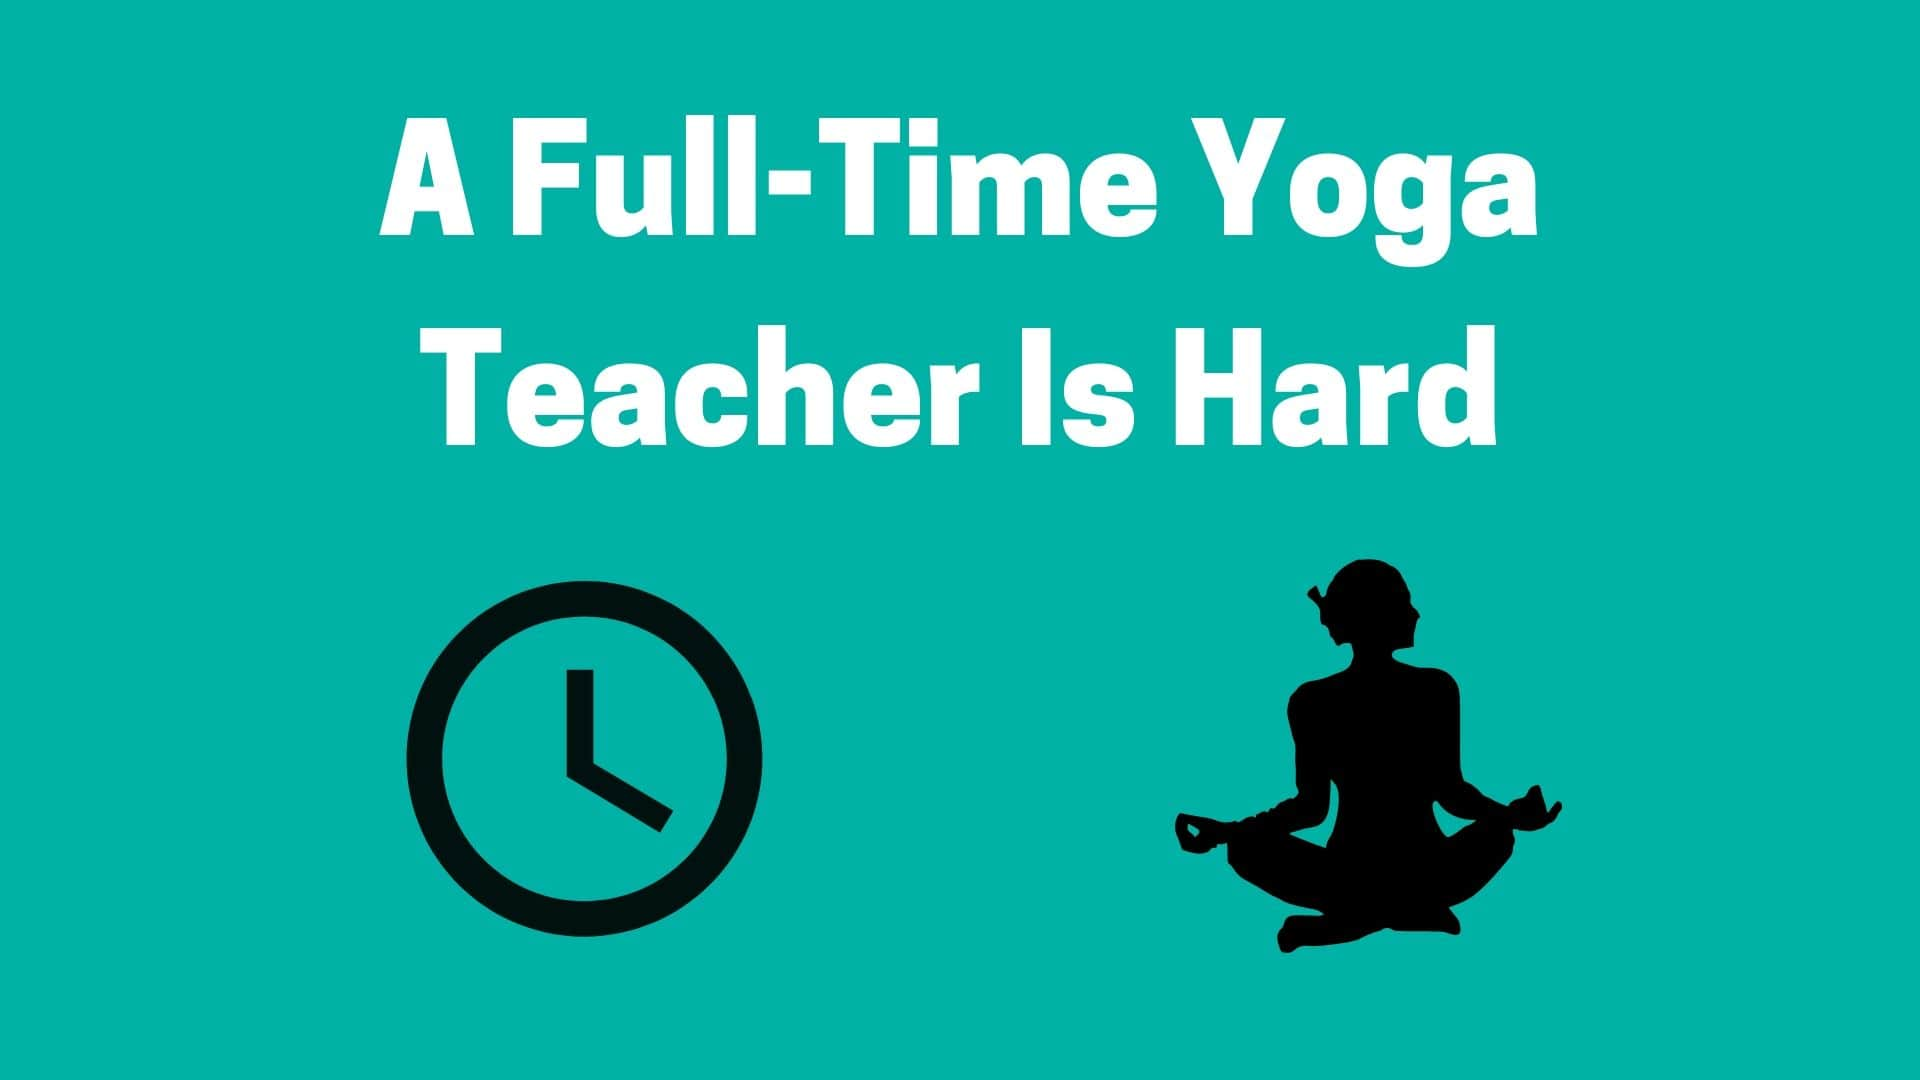 Life Of Yoga Teacher - It's Hard Job